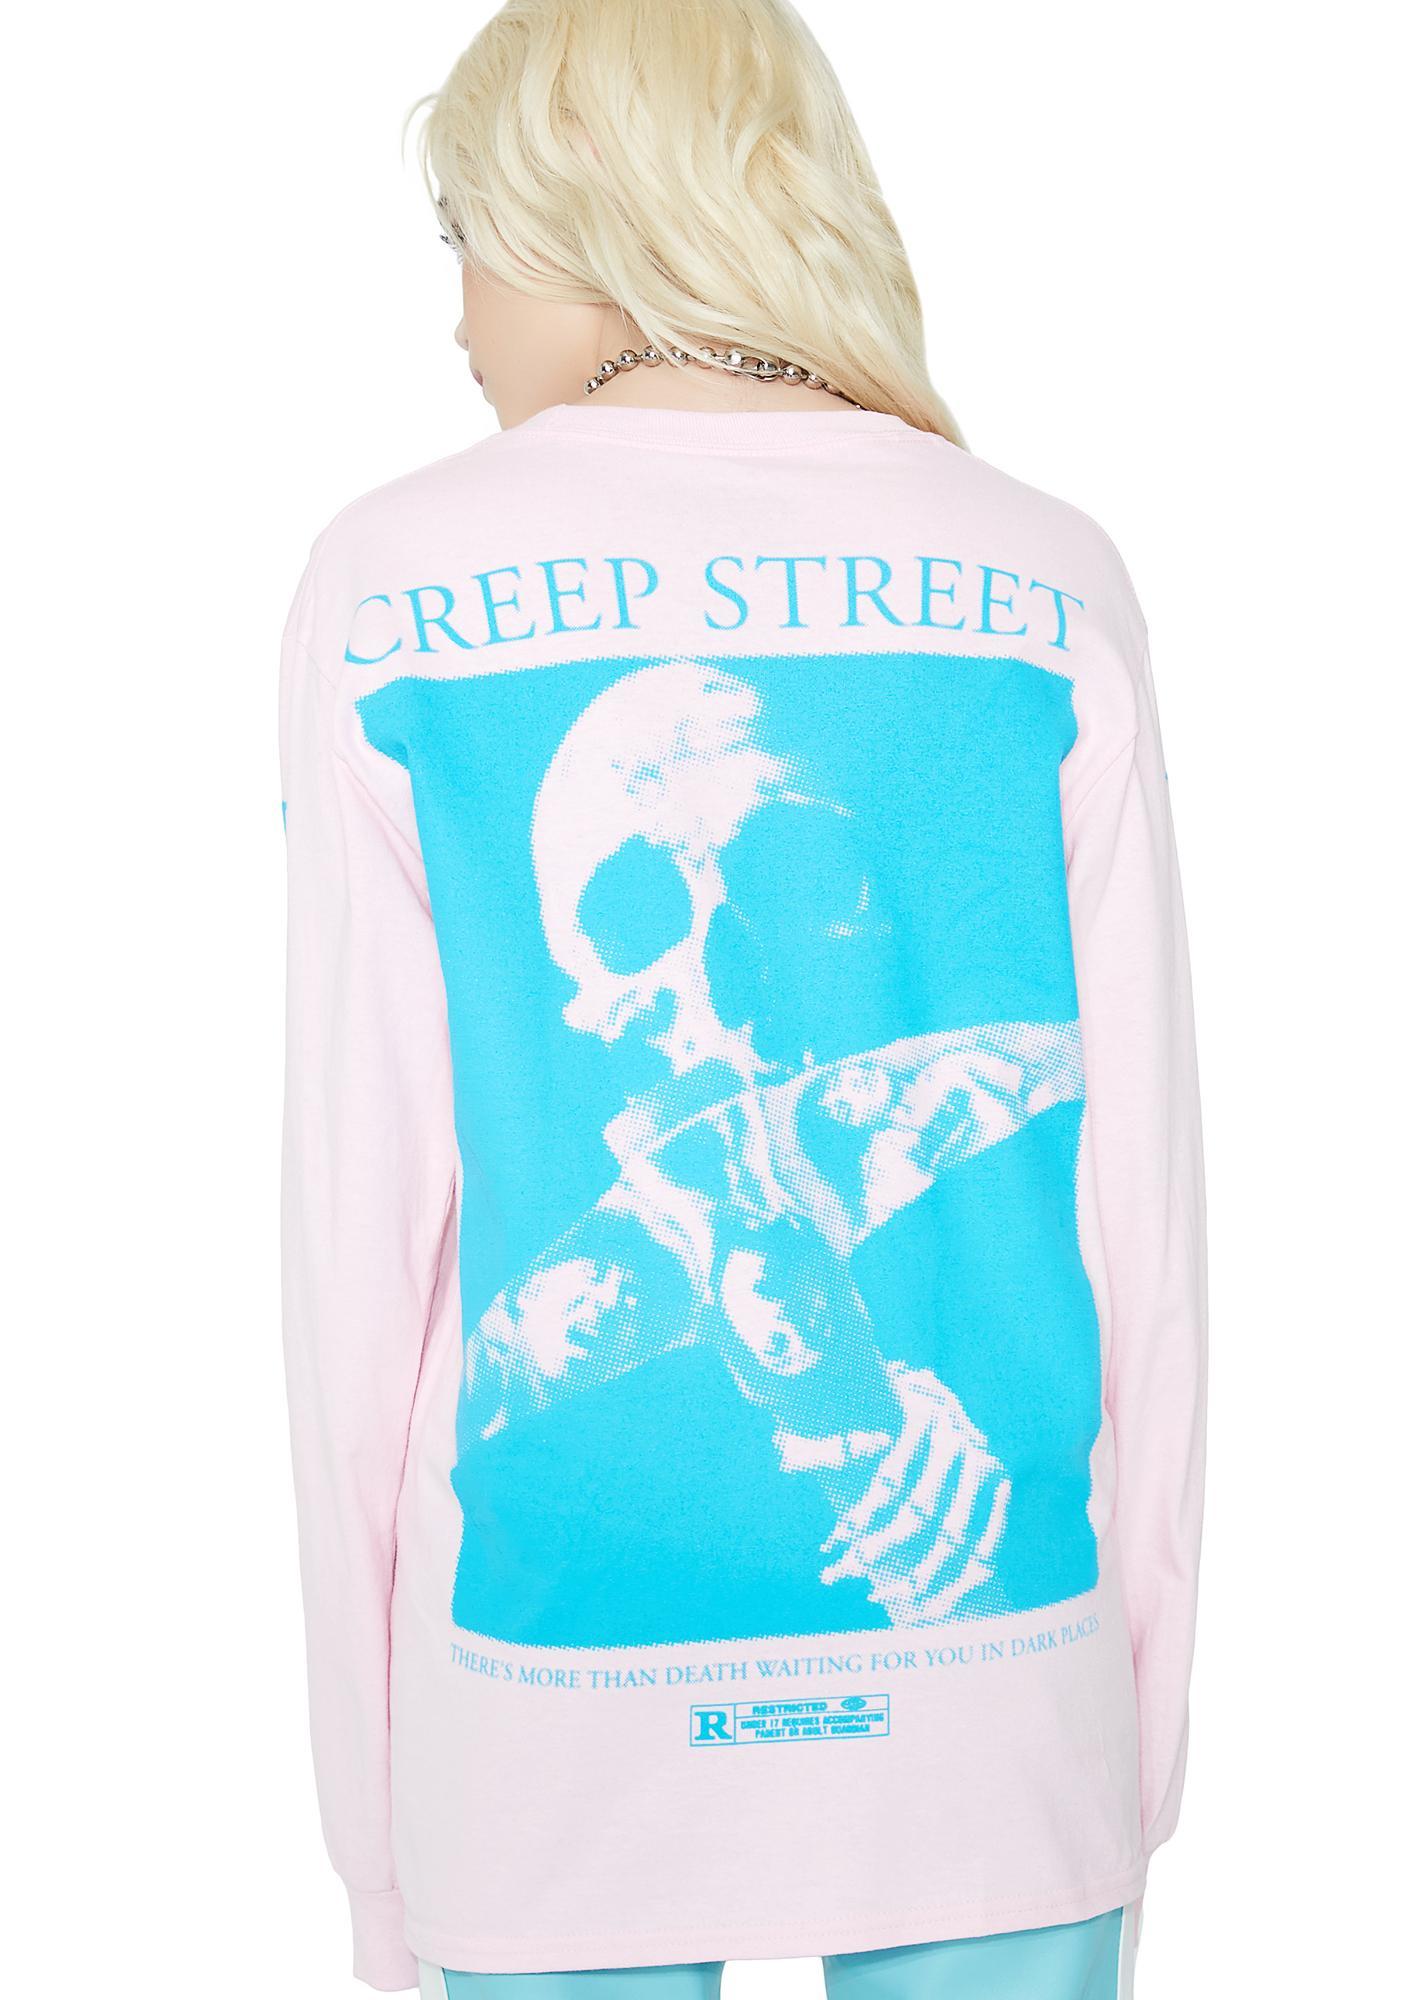 Creep Street Blackout Darkness Tee